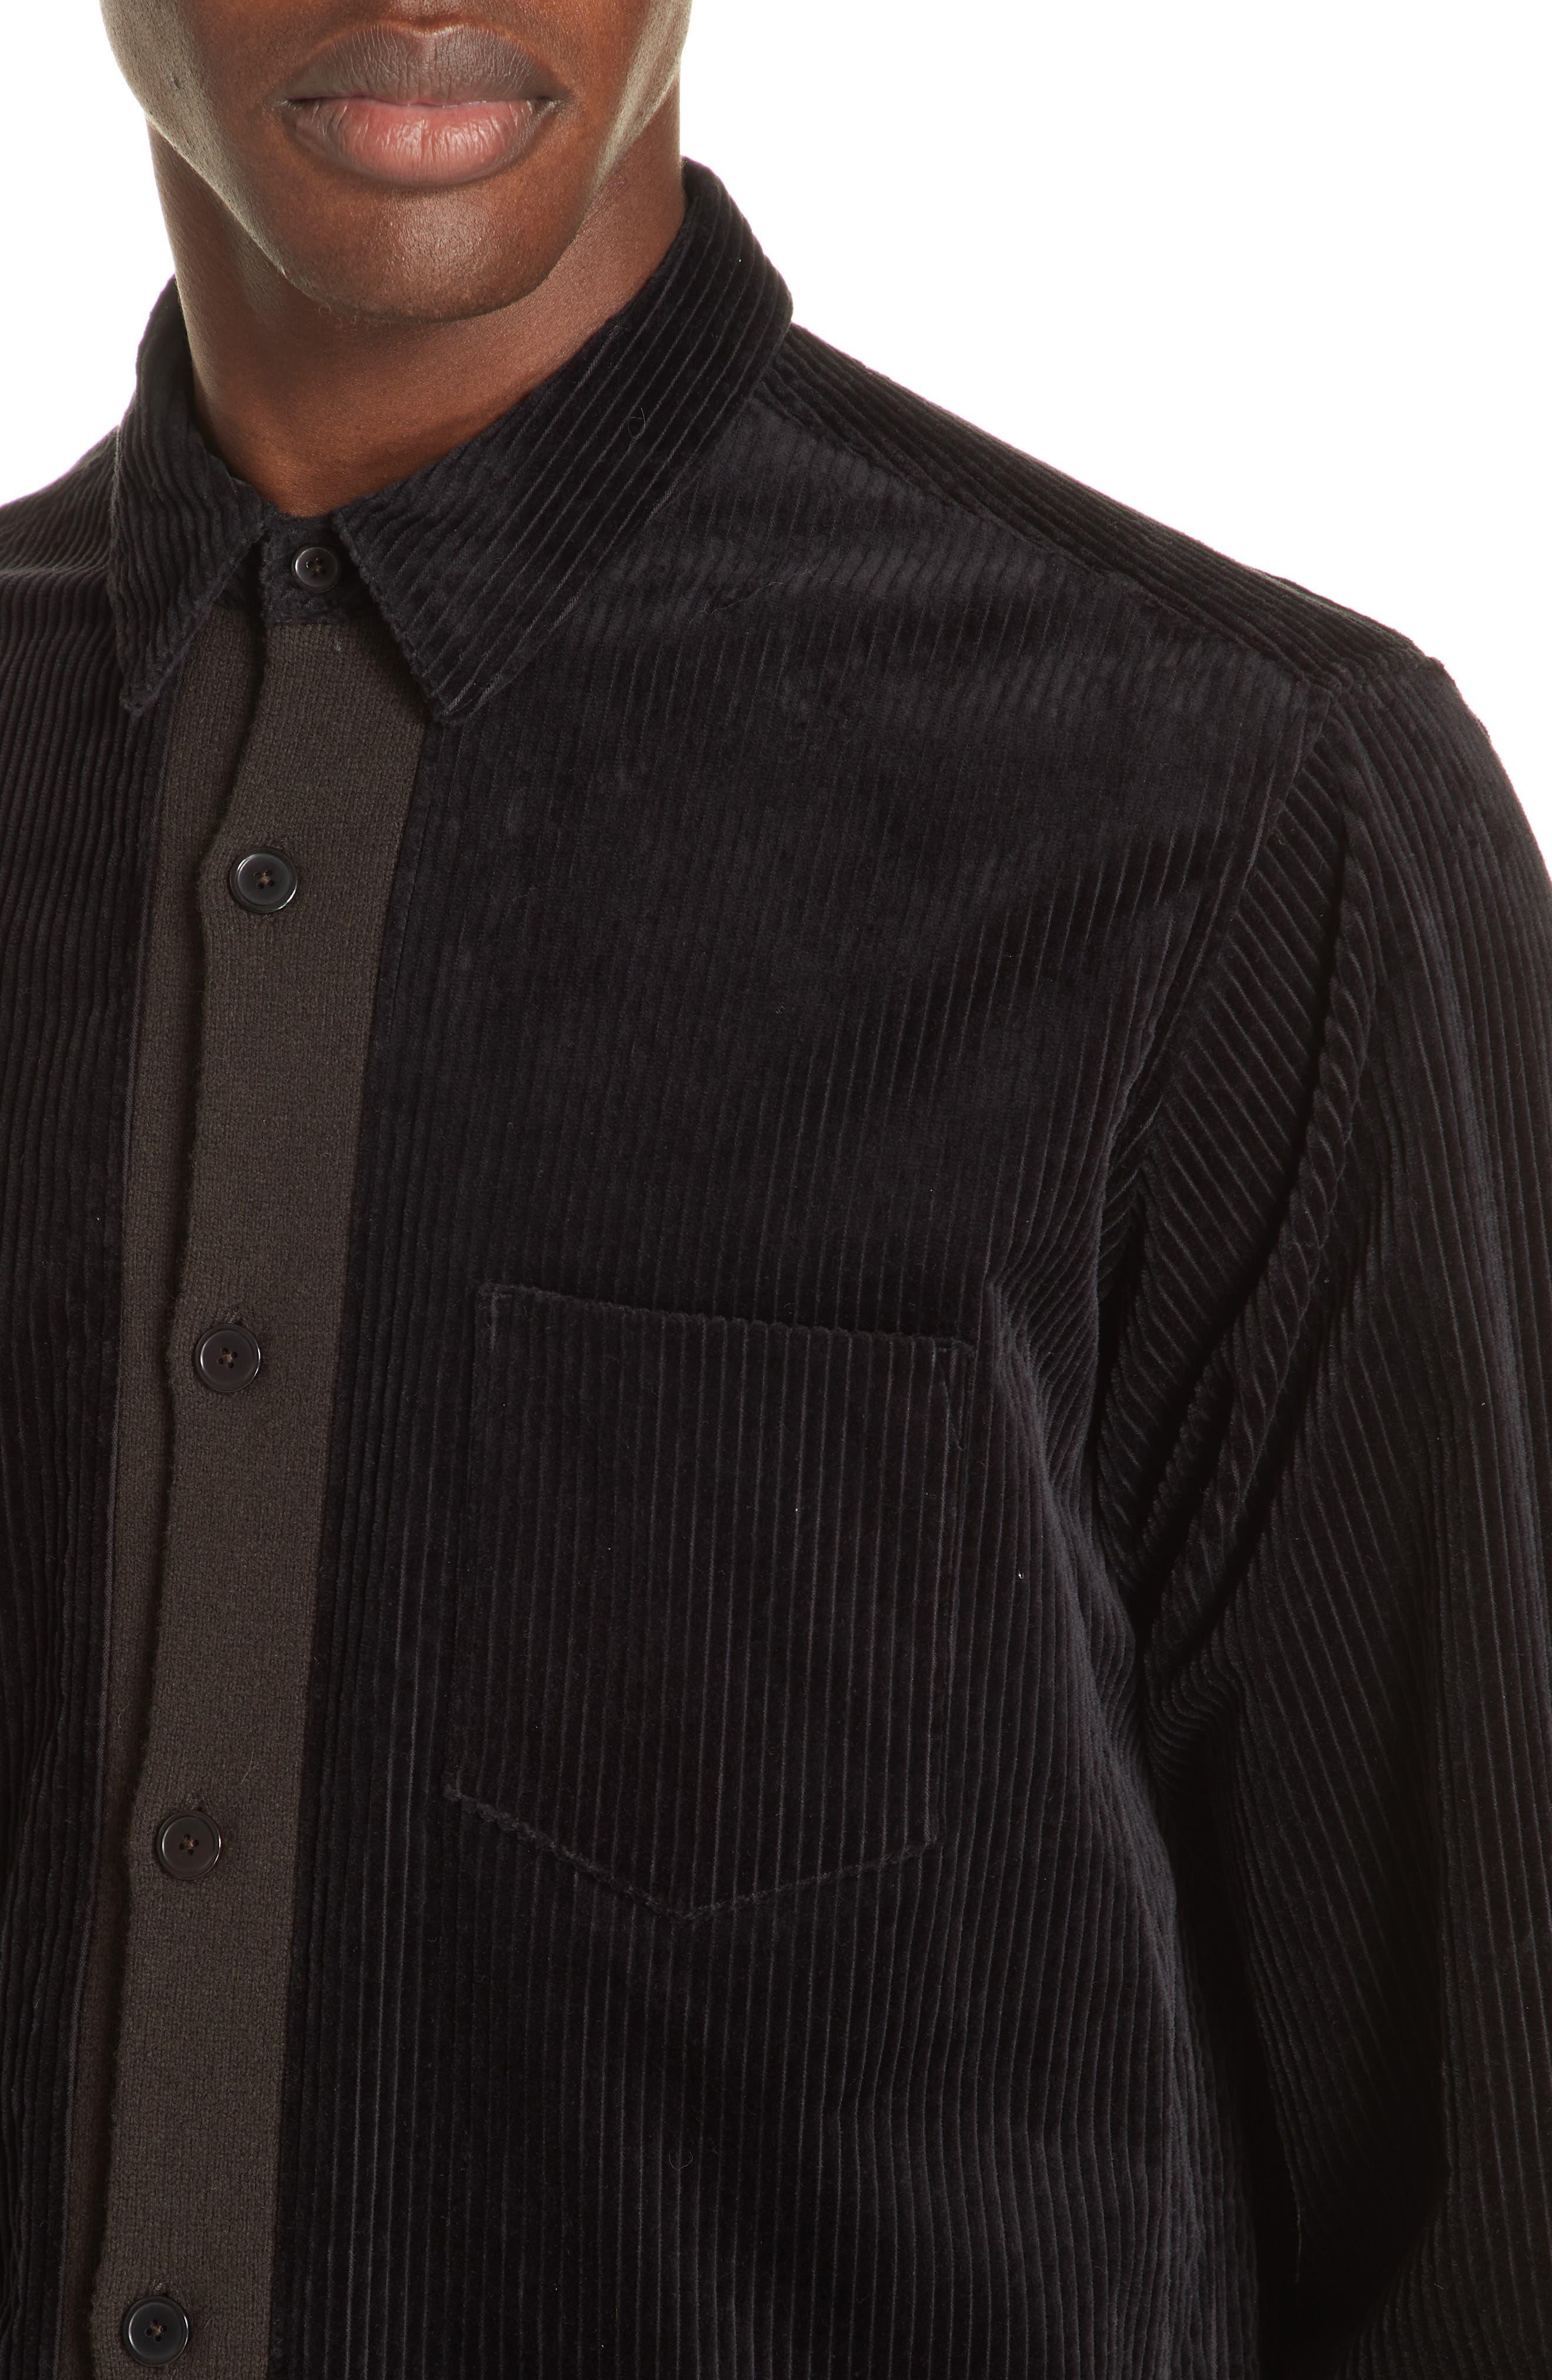 TOMORROWLAND,                             Corduroy Shirt,                             Alternate thumbnail 2, color,                             001